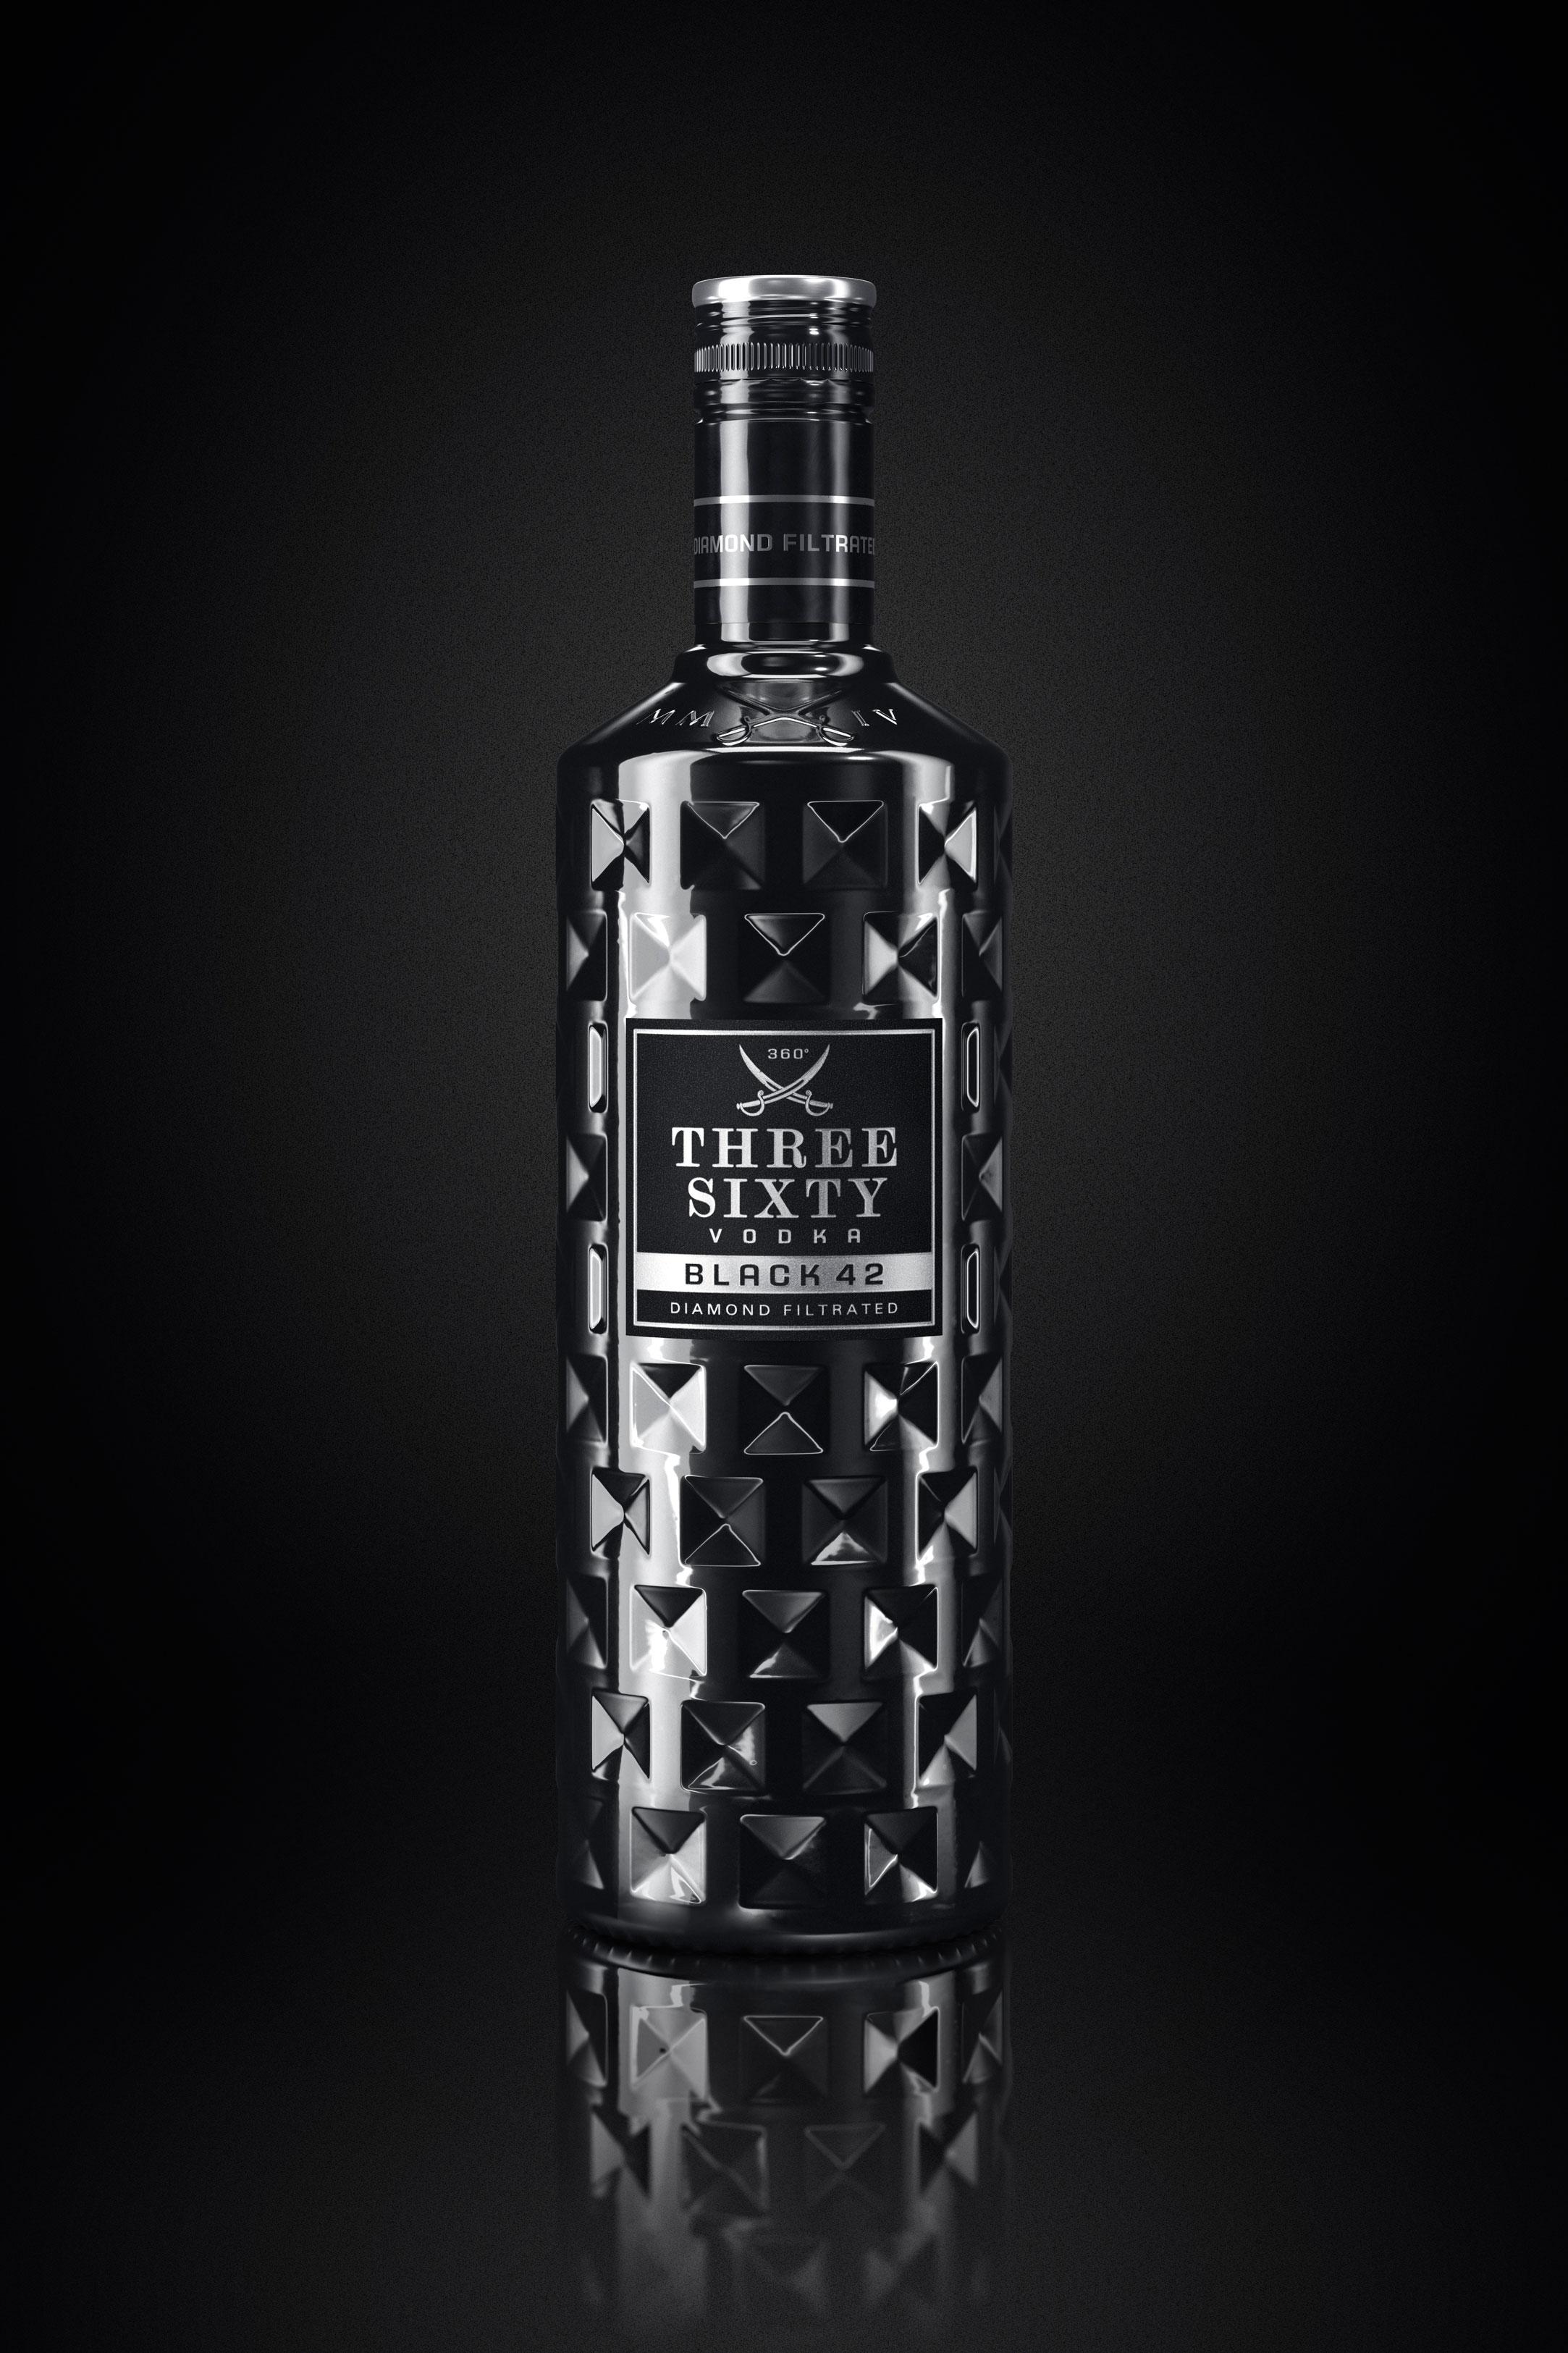 Three Sixty Vodka Glas Gläser-Set - 6x Black Longdrink-Gläser eckig schwarz